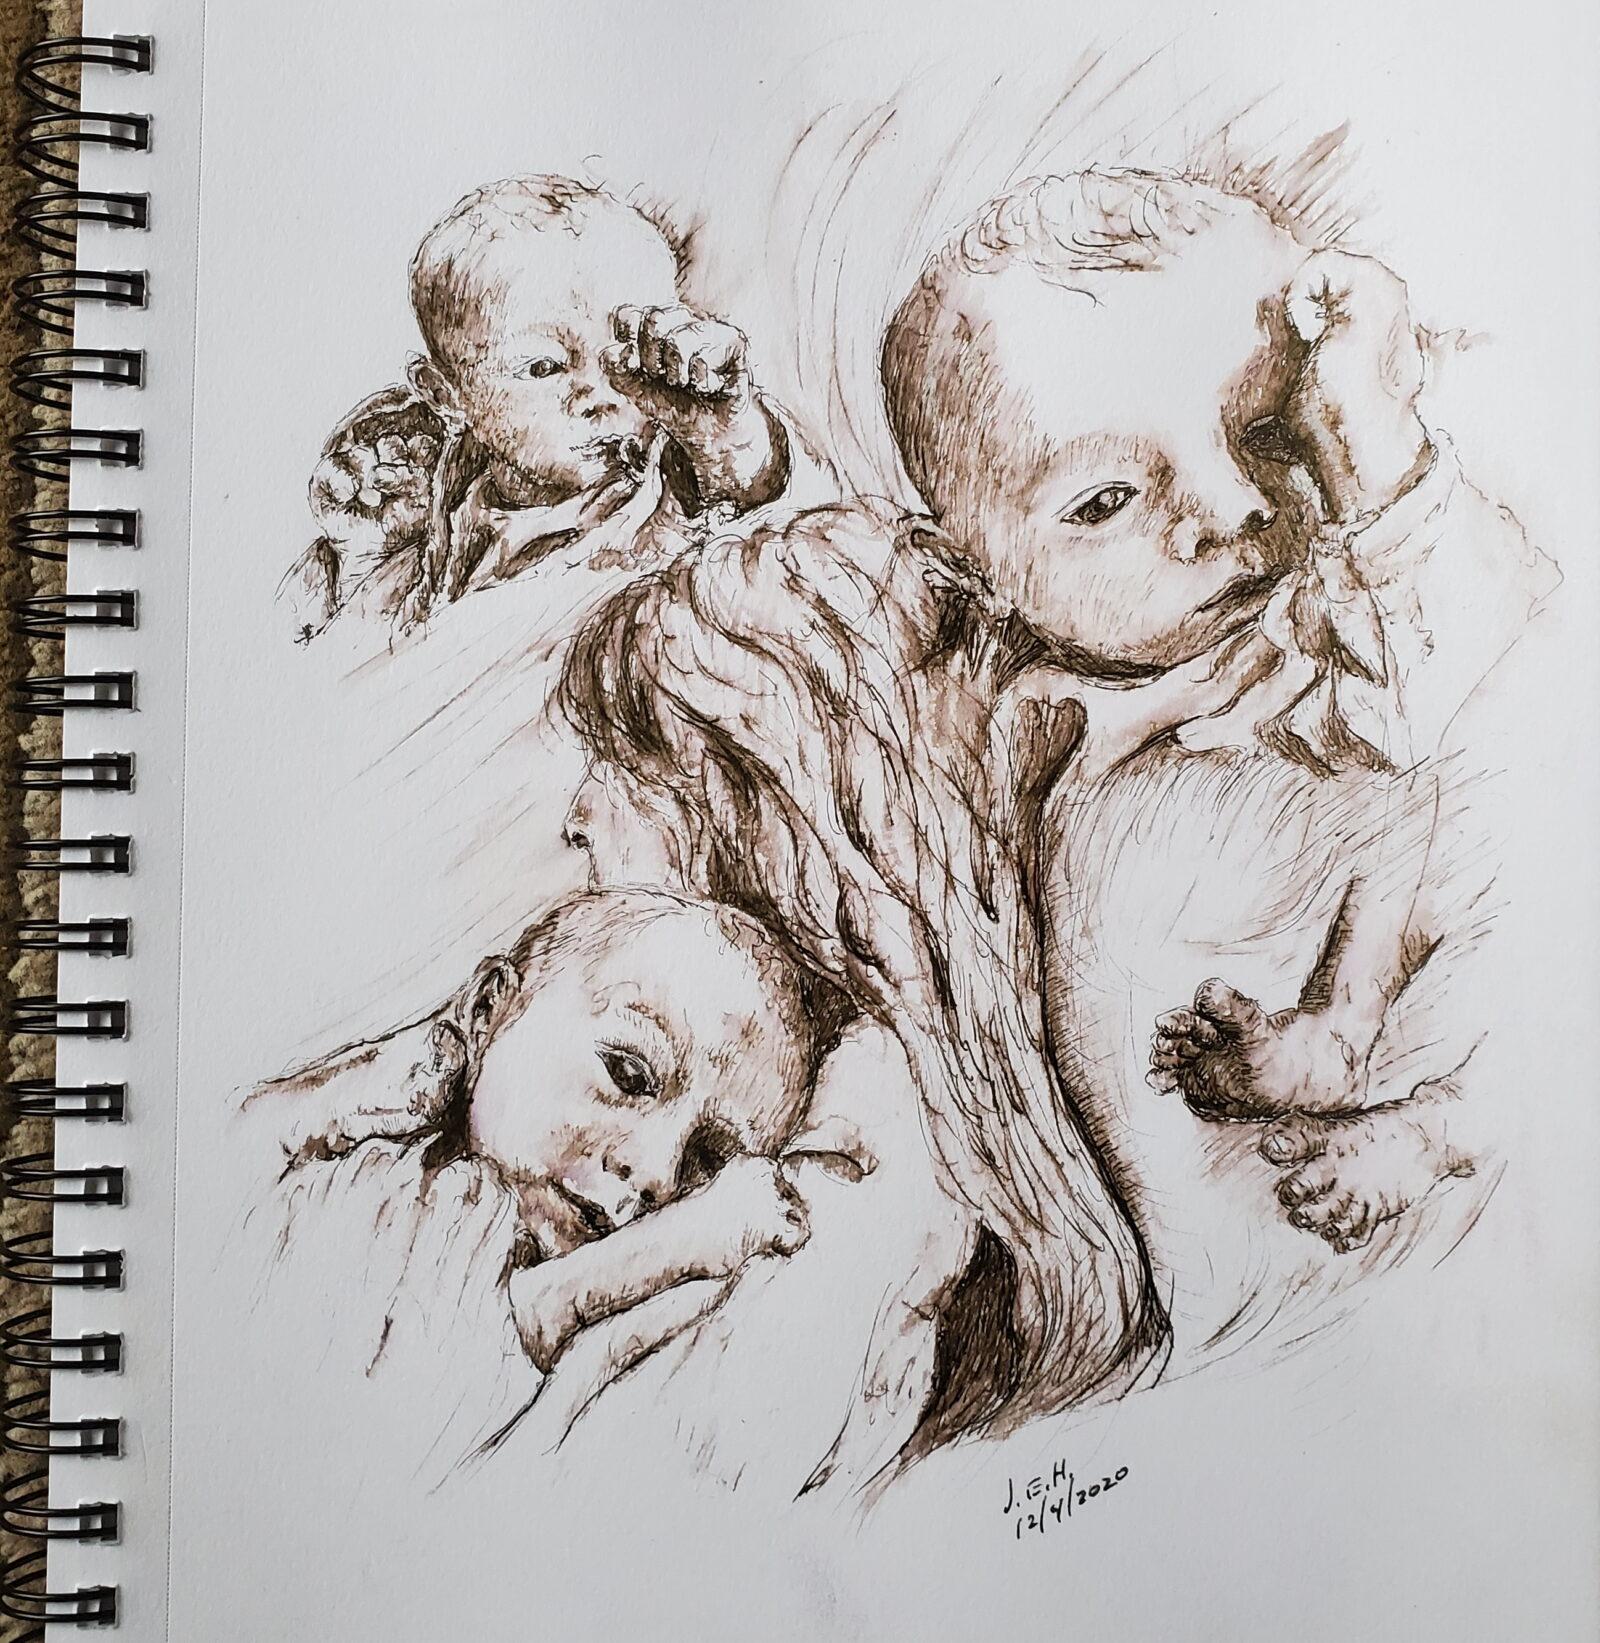 Art work, pen and ink sketch by John Huisman